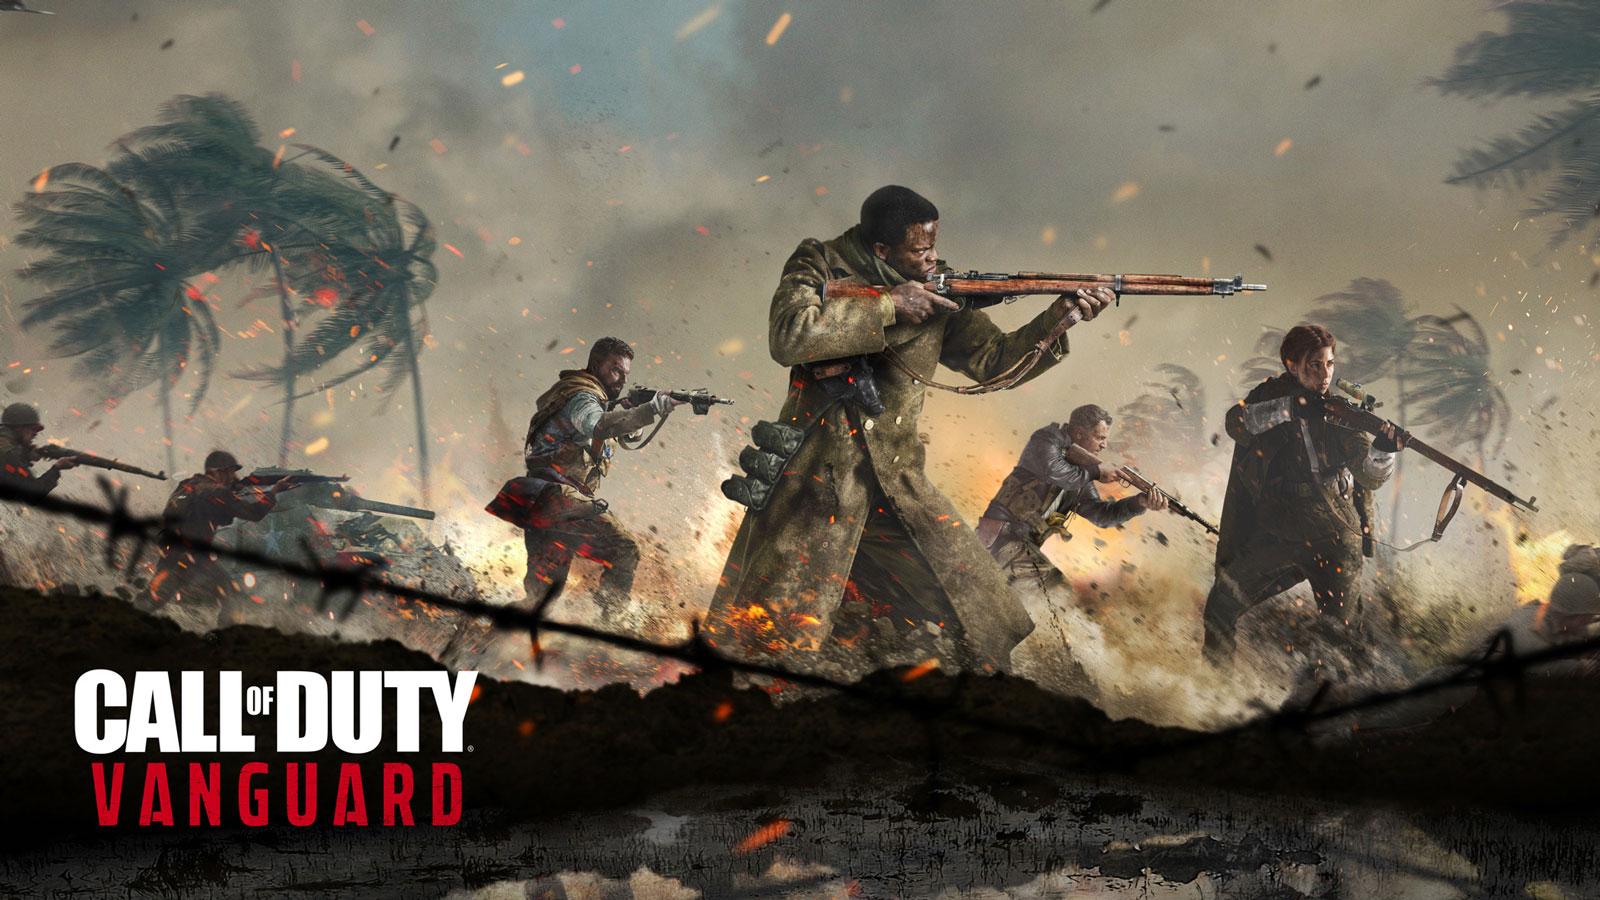 Free Call of Duty: Vanguard Wallpaper in 1600x900